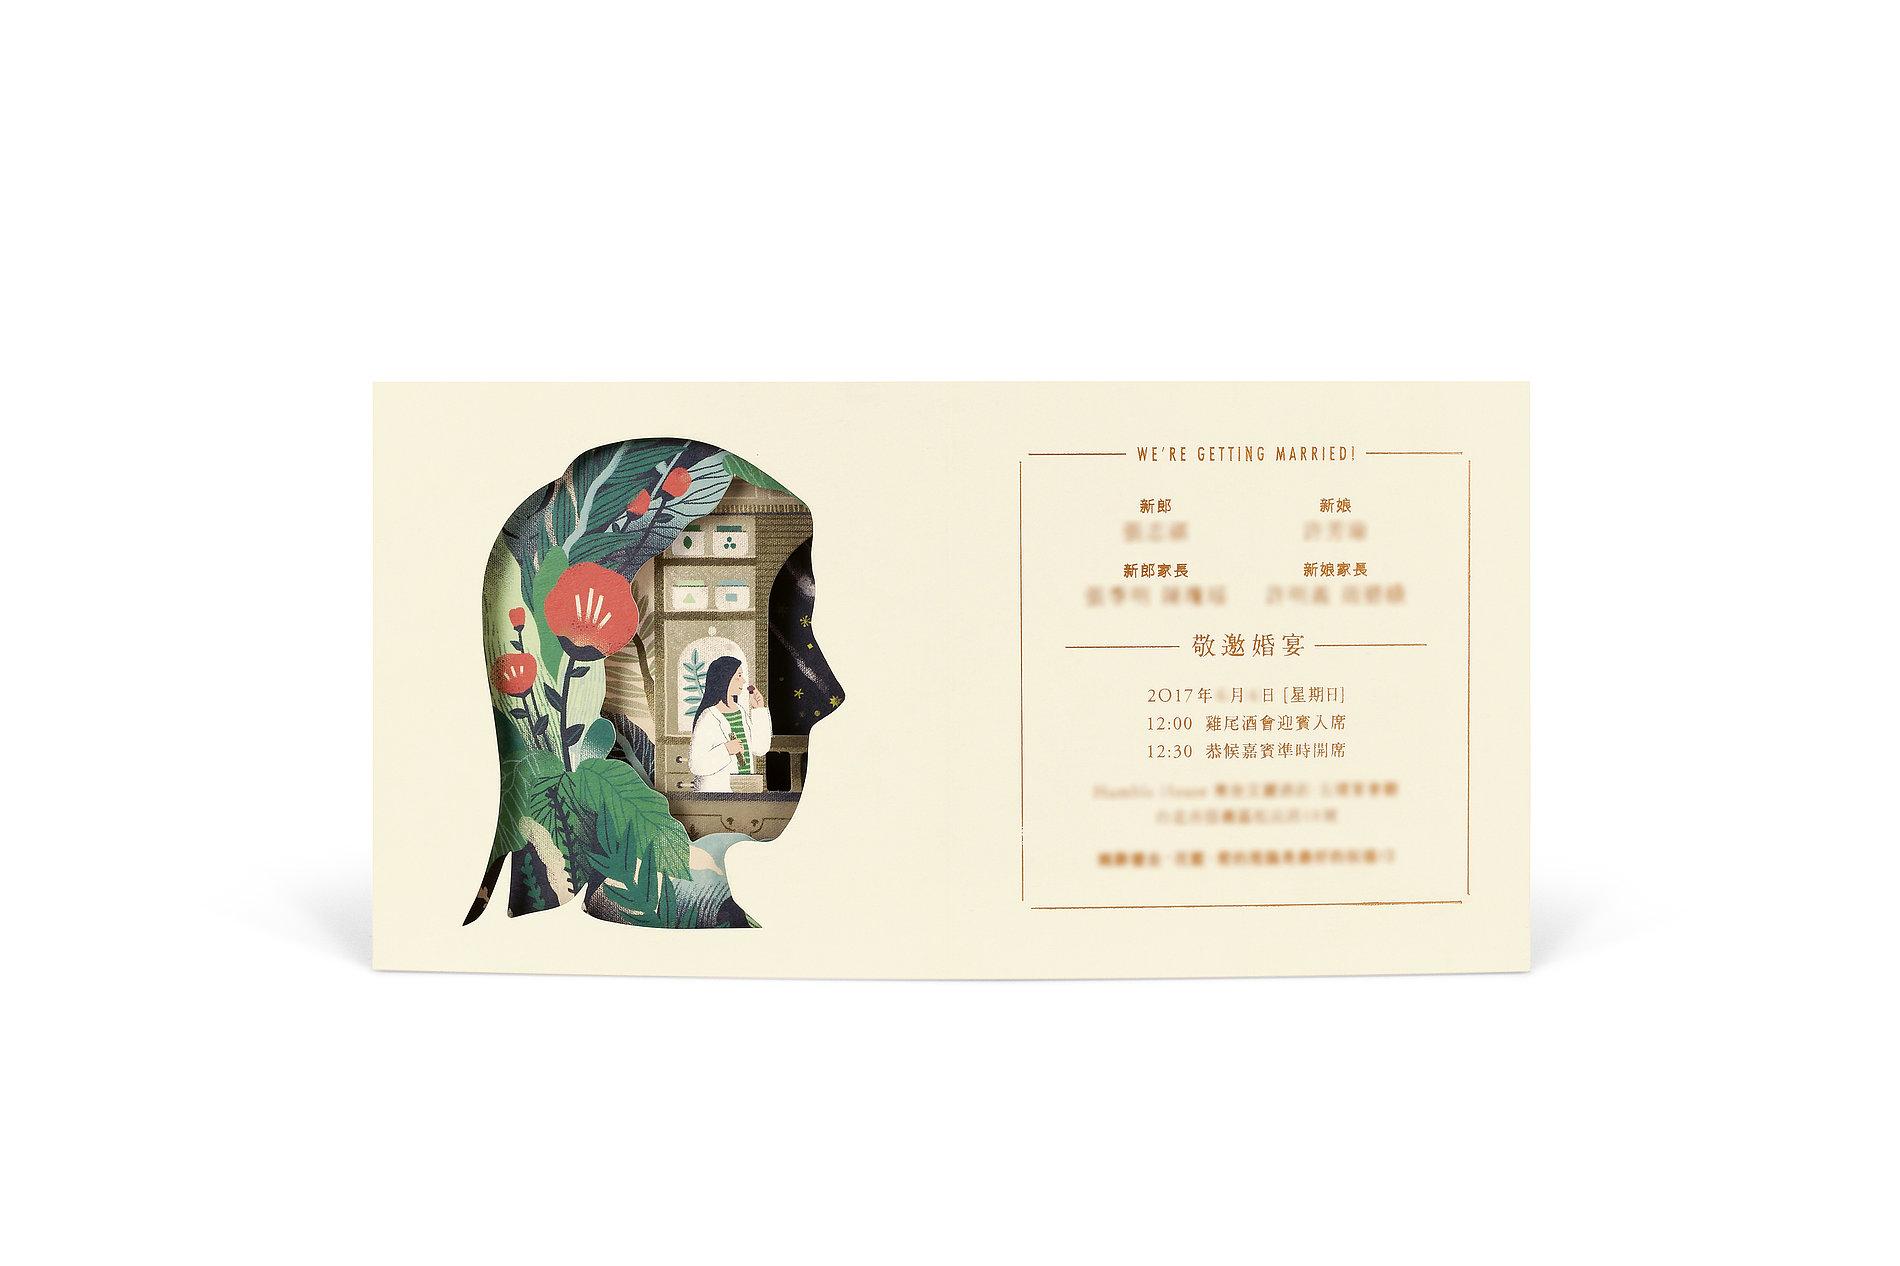 C&H Pop-Up Wedding Invitation | Red Dot Design Award